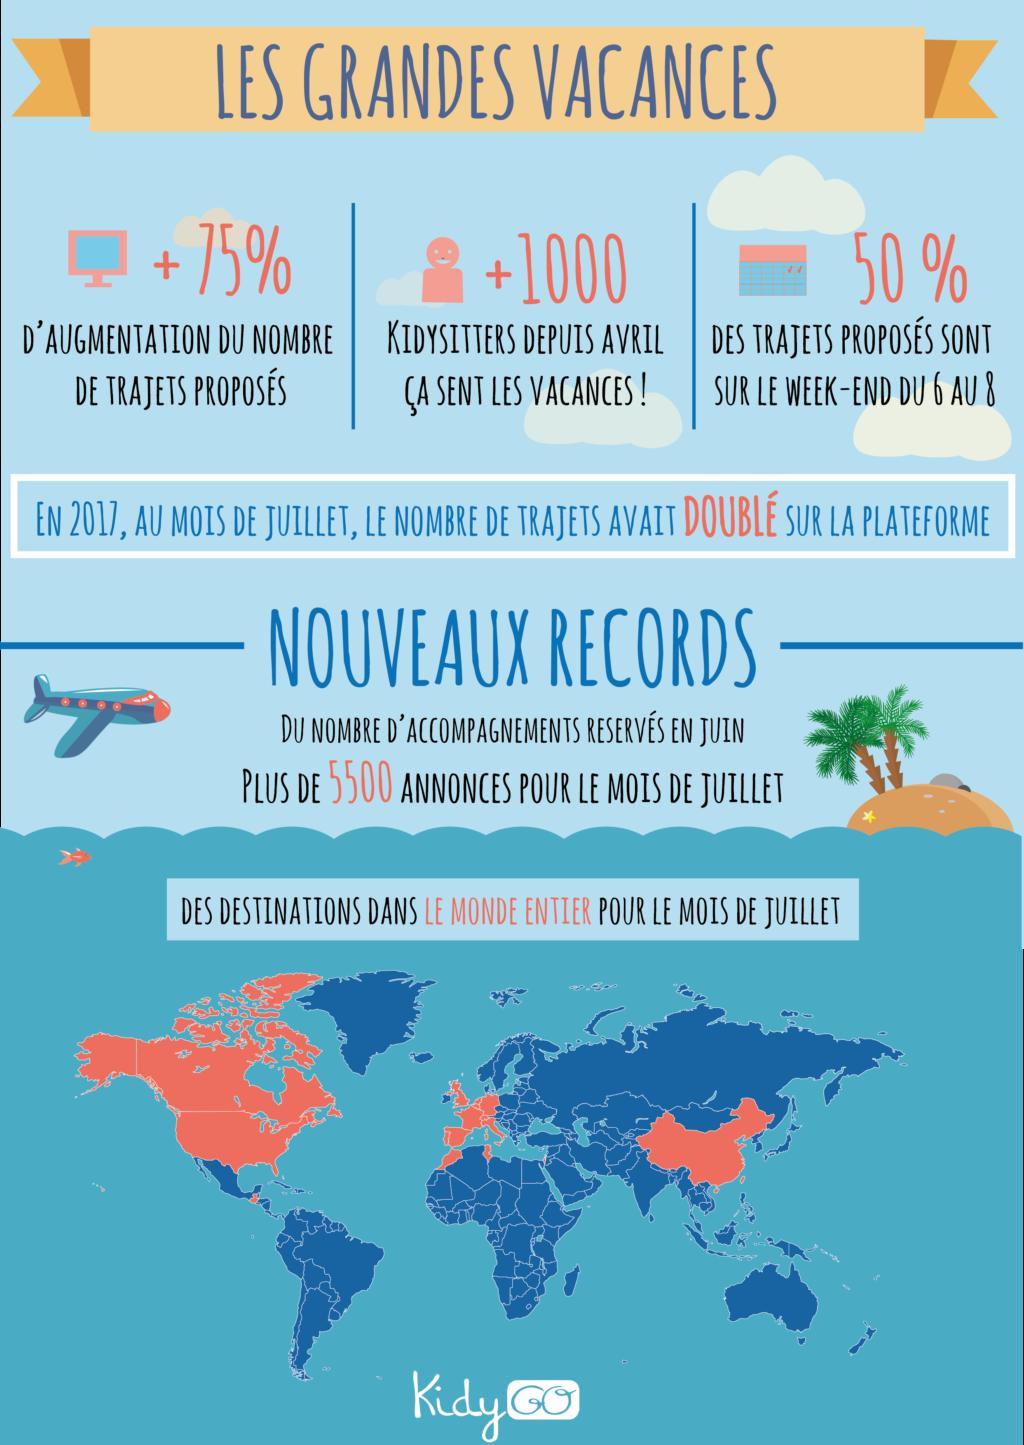 Infographie Grandes Vacances 2018 KidyGo